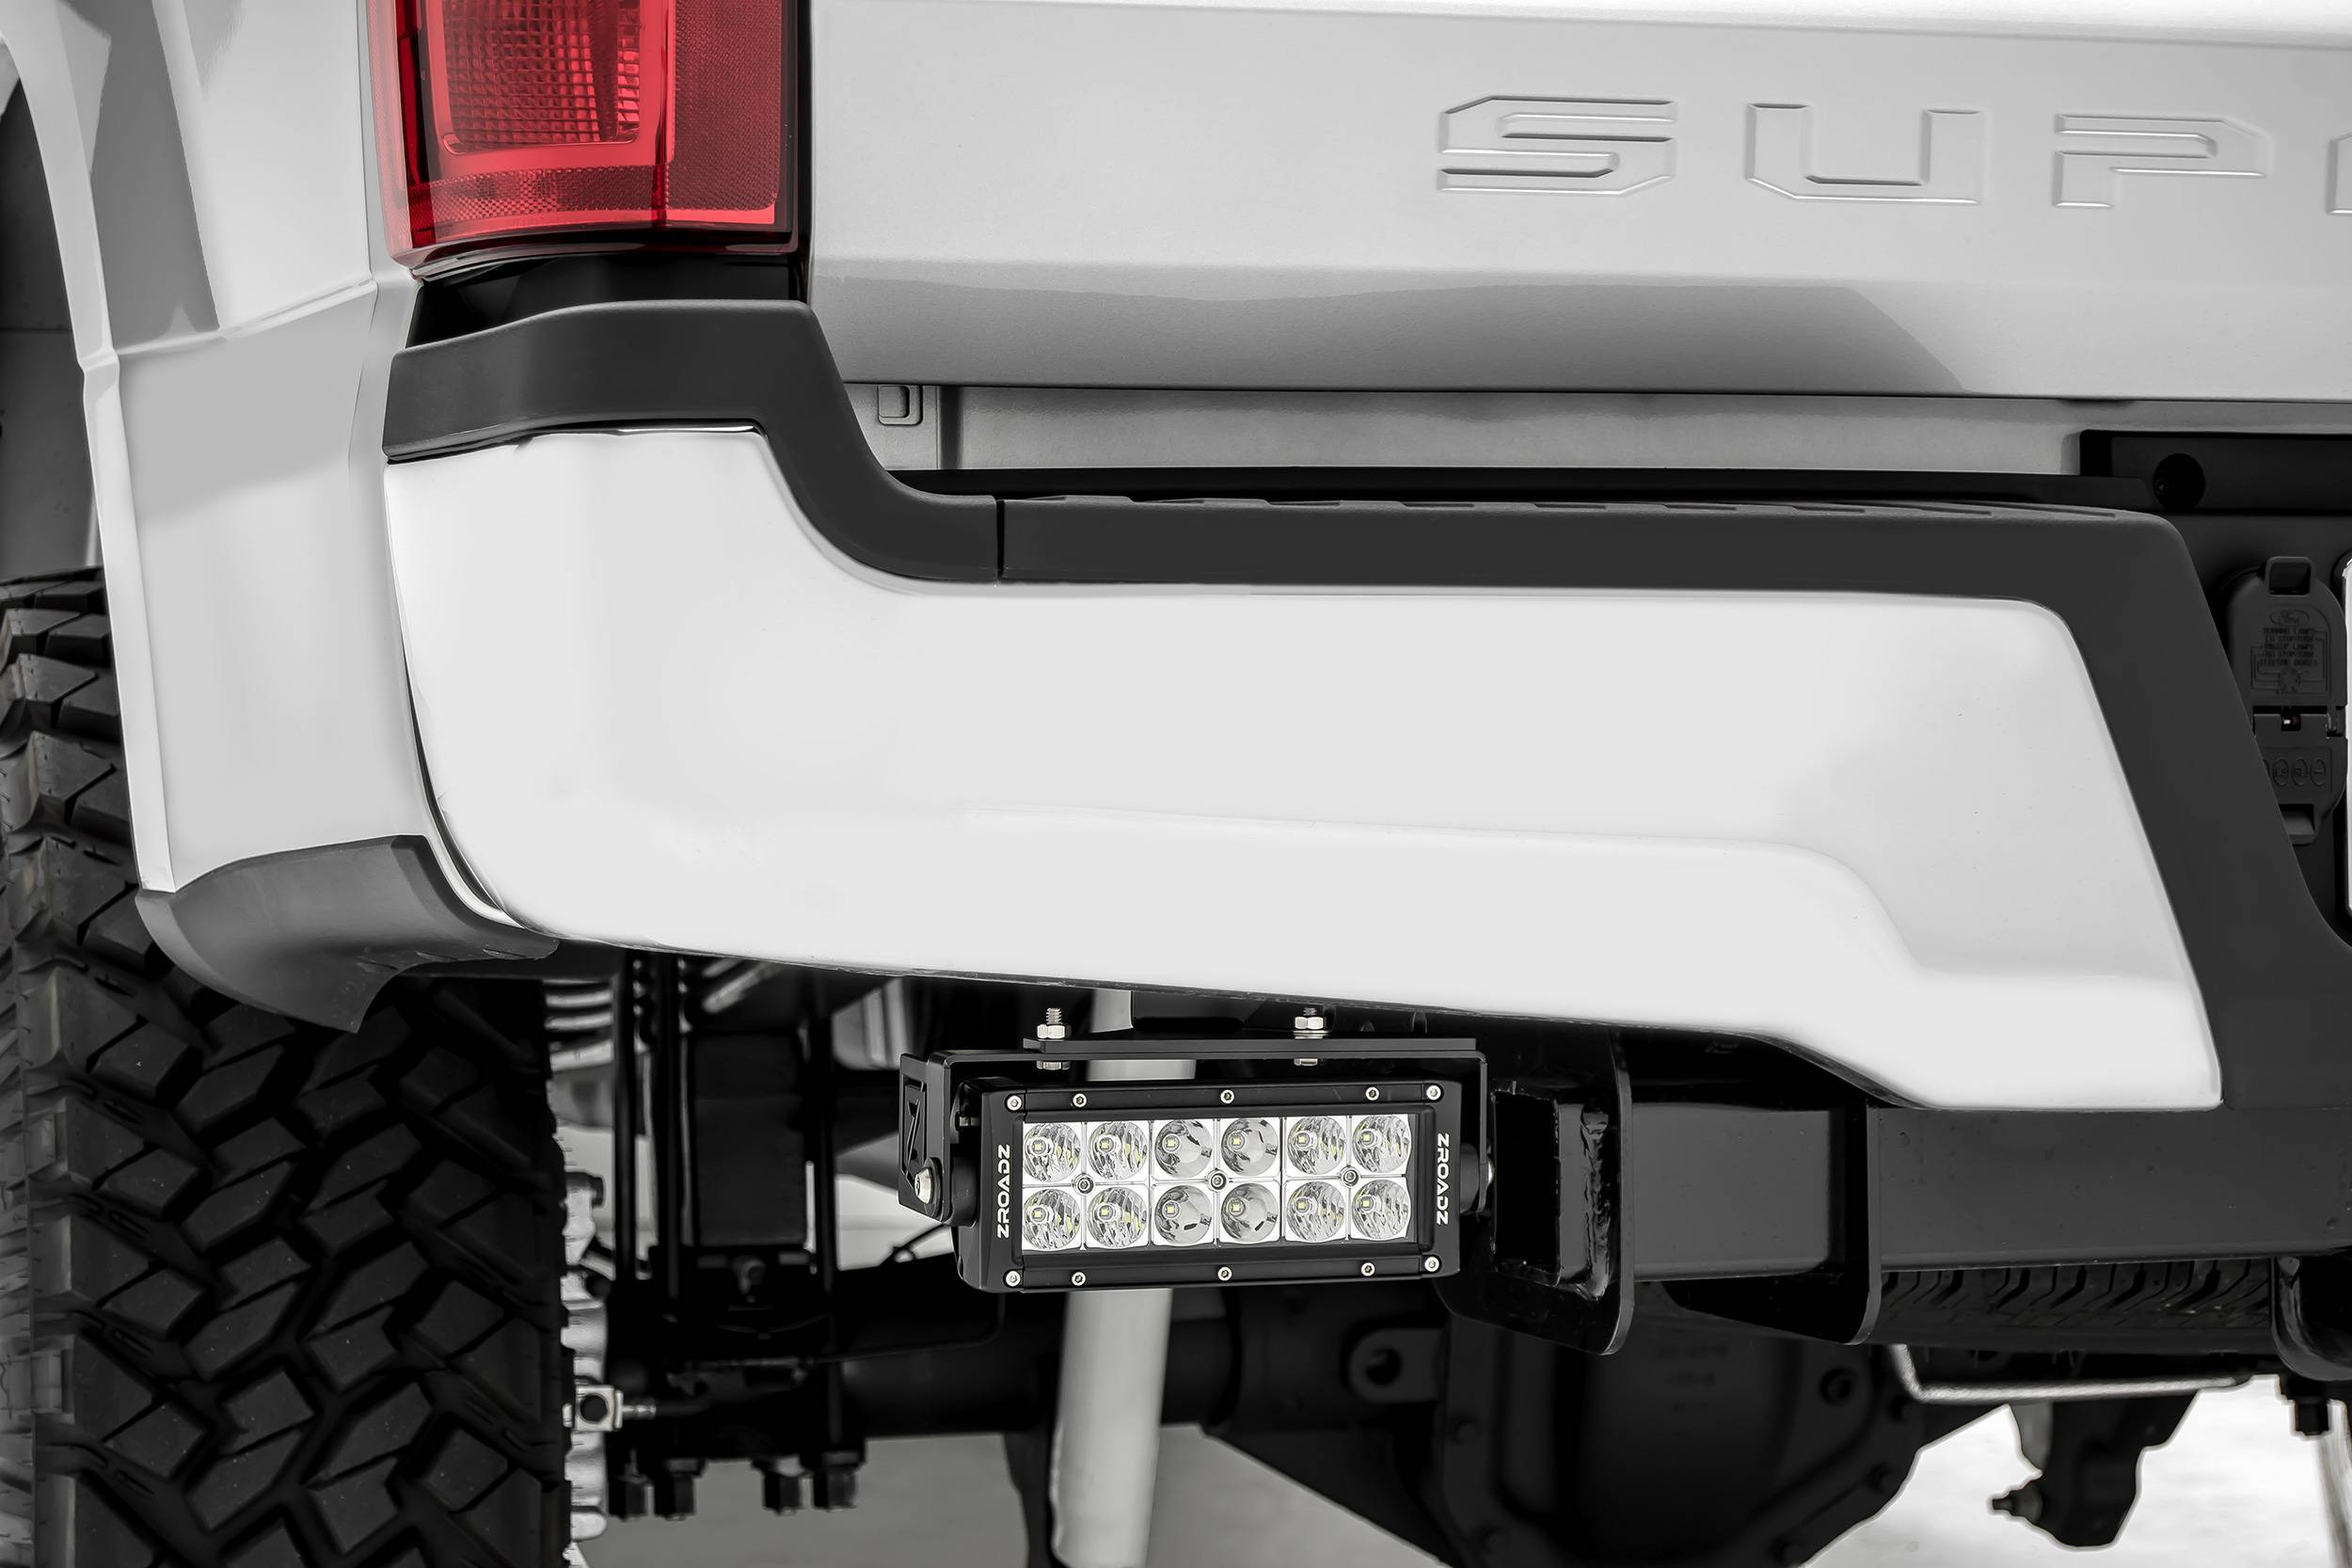 ZROADZ - 2017-2021 Ford Super Duty Rear Bumper LED Kit with (2) 6 Inch LED Straight Double Row Light Bars - PN #Z385471-KIT